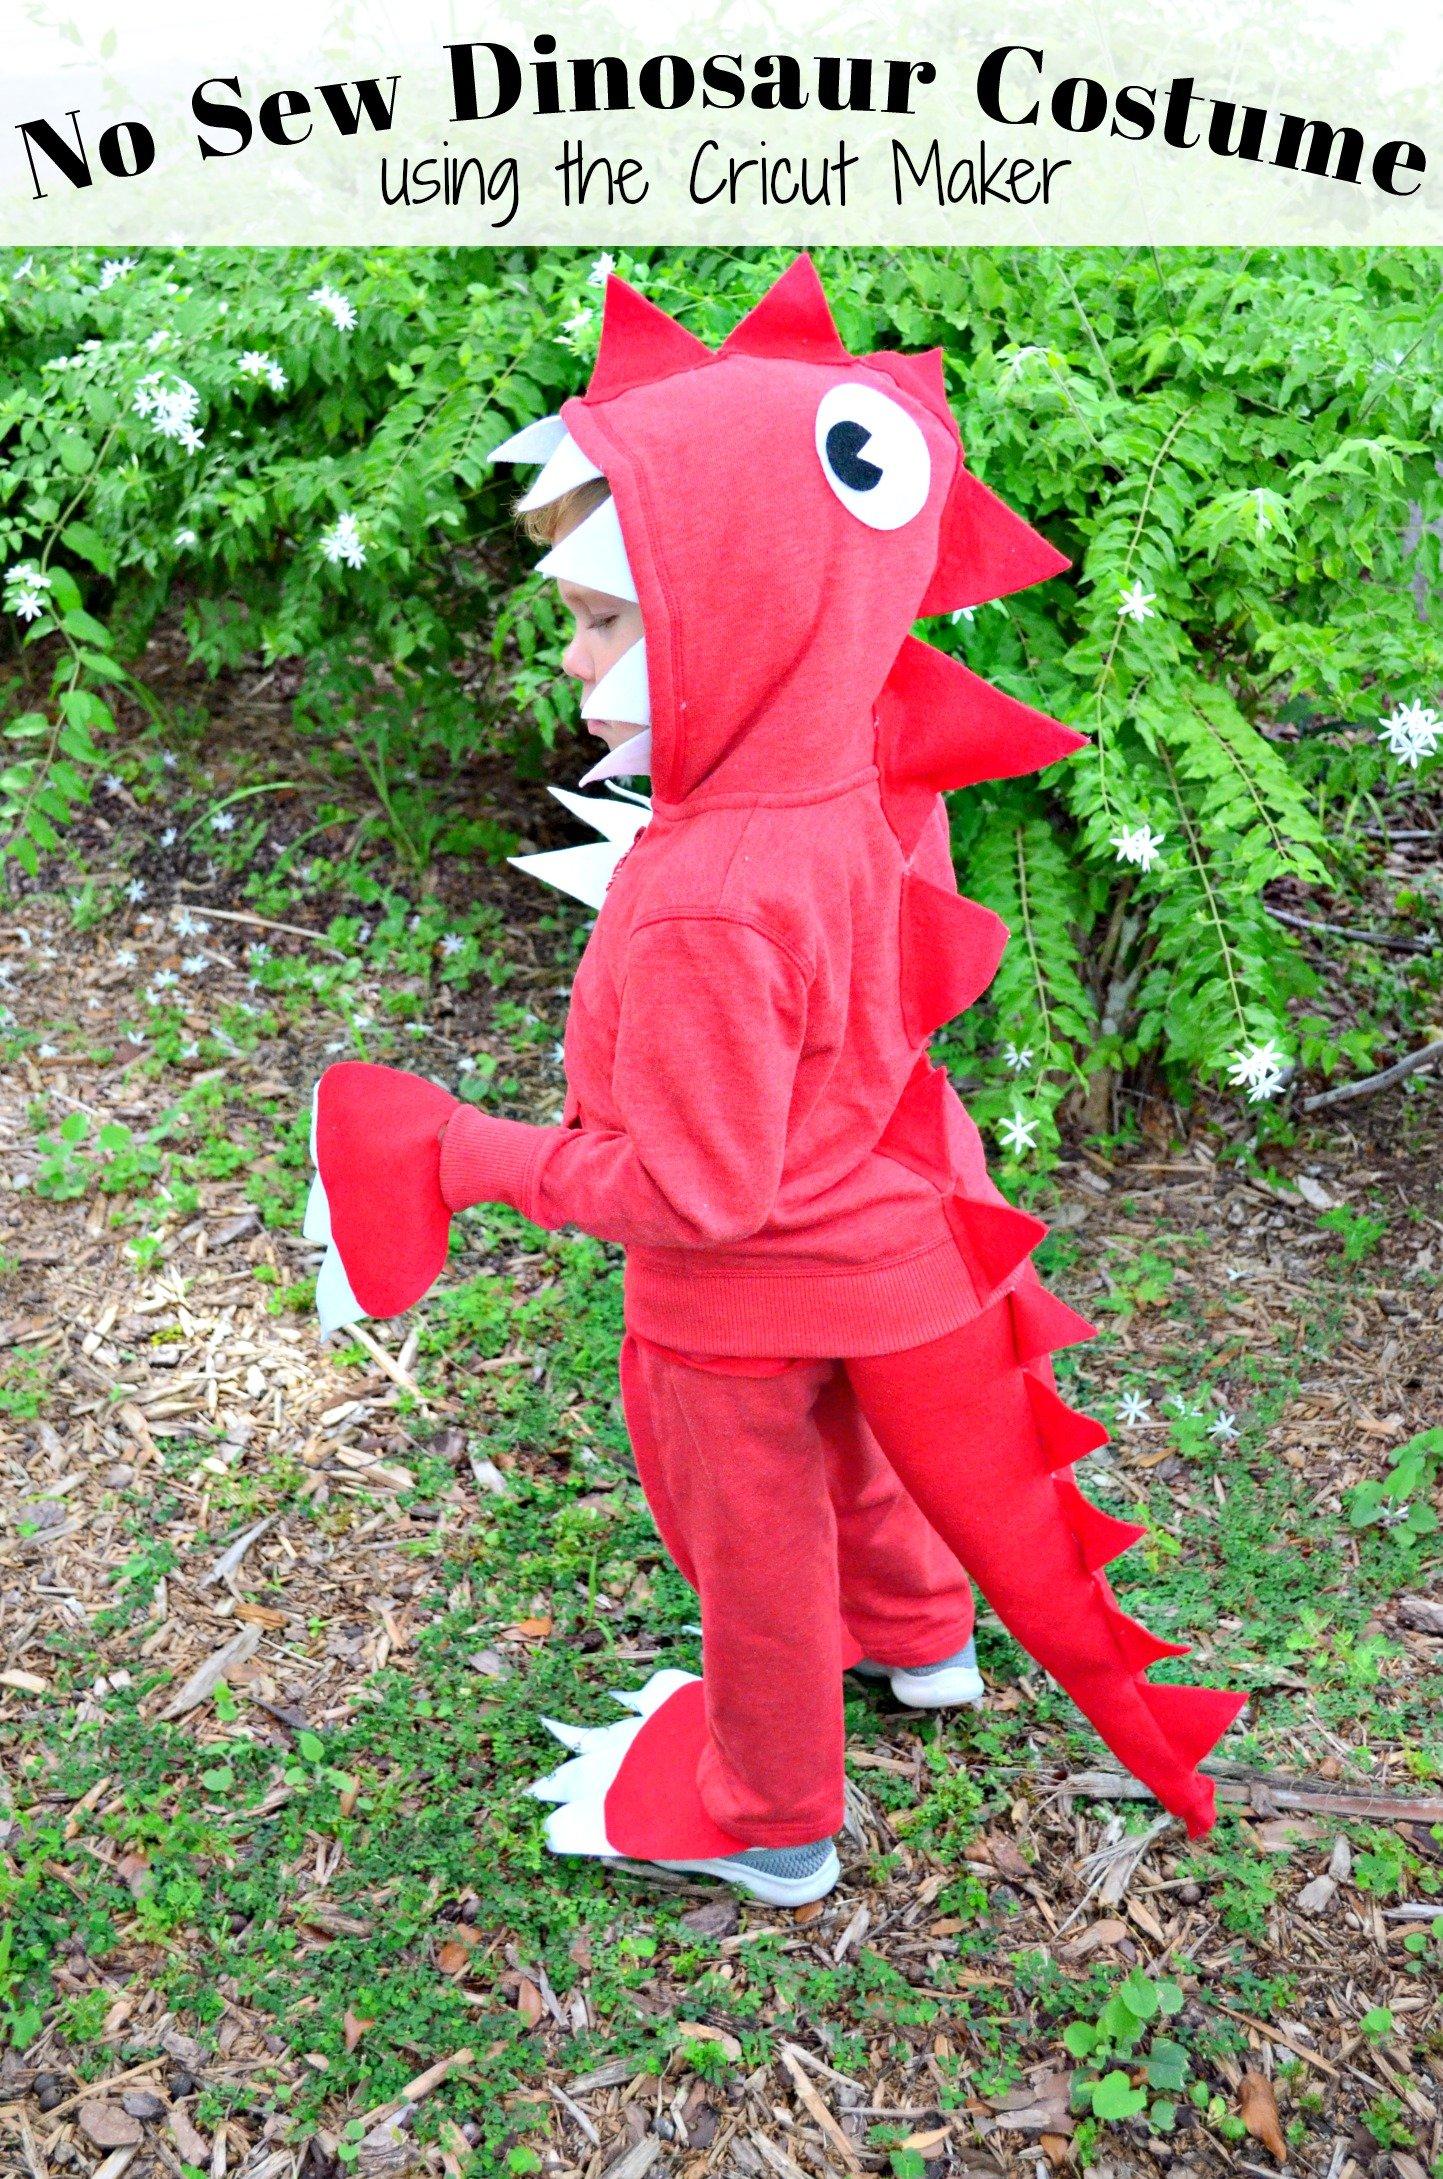 No Sew Dinosaur Costume